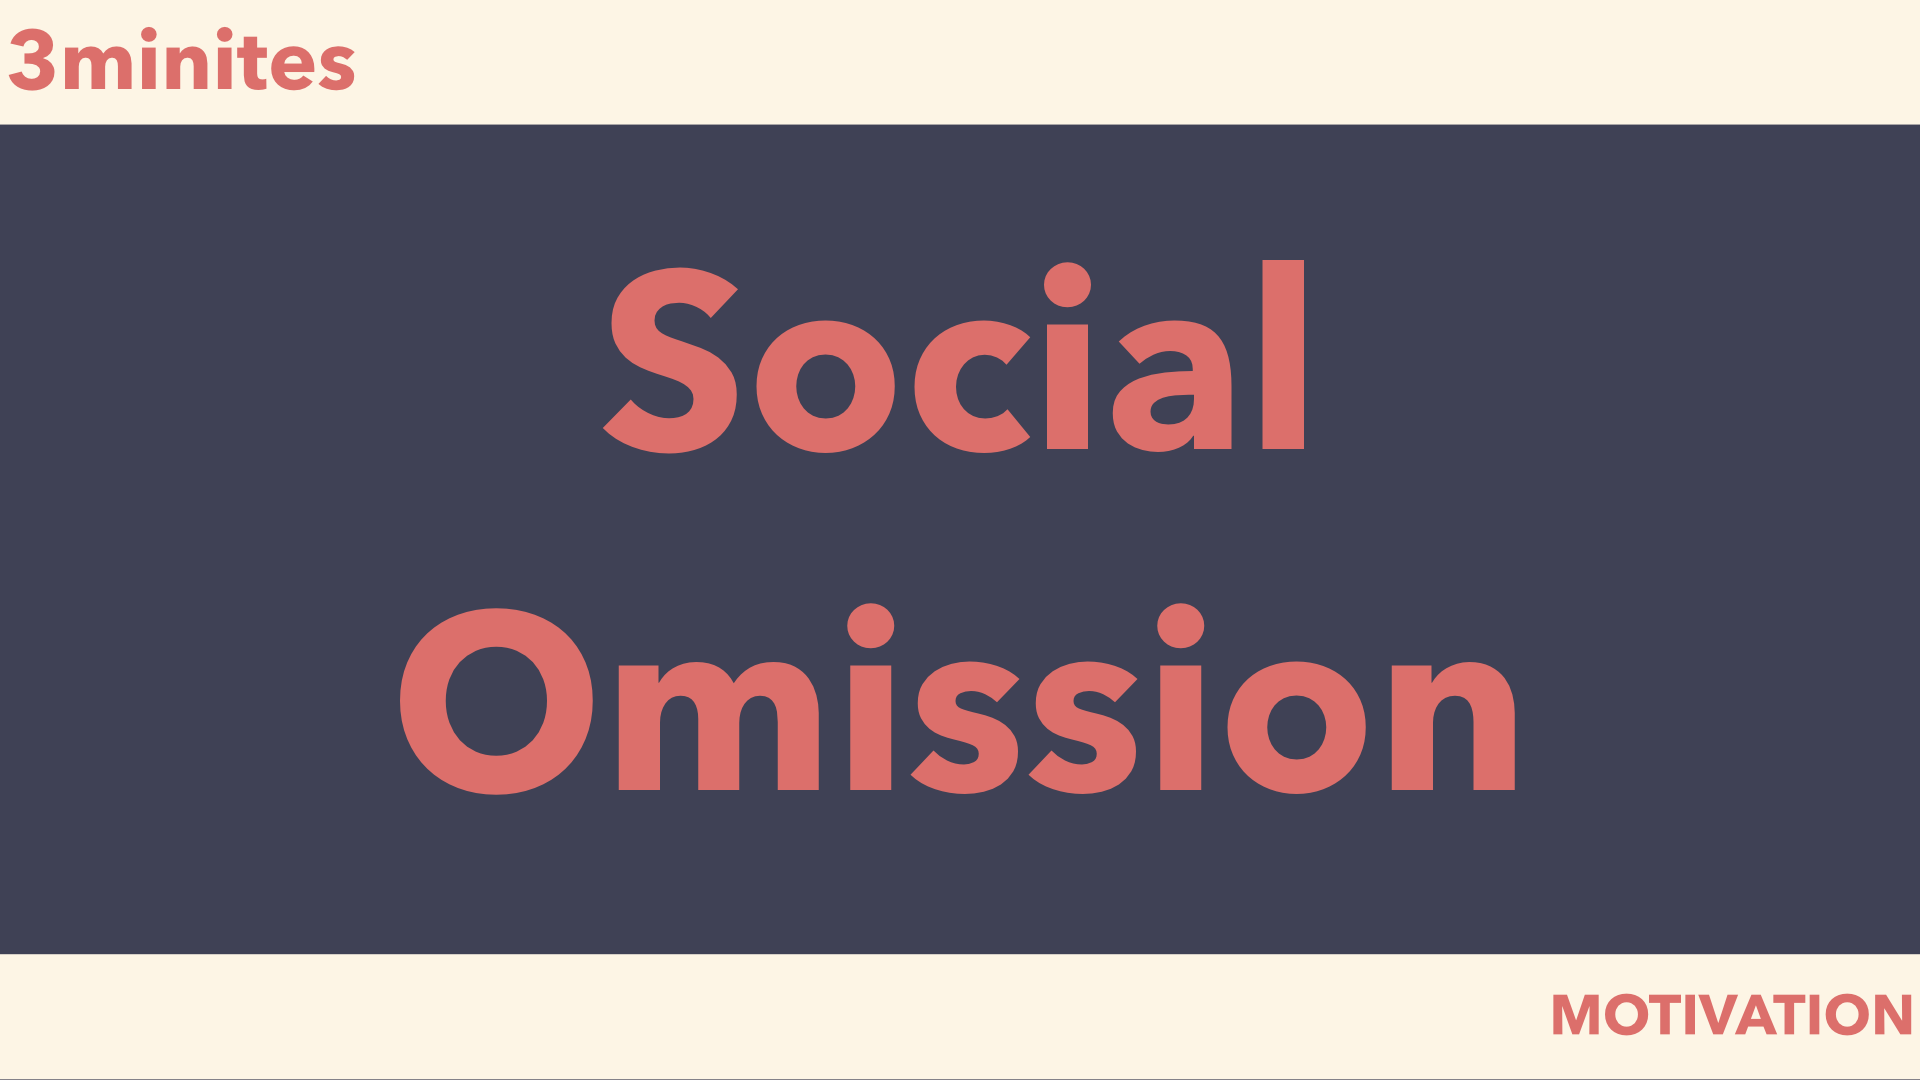 social omission